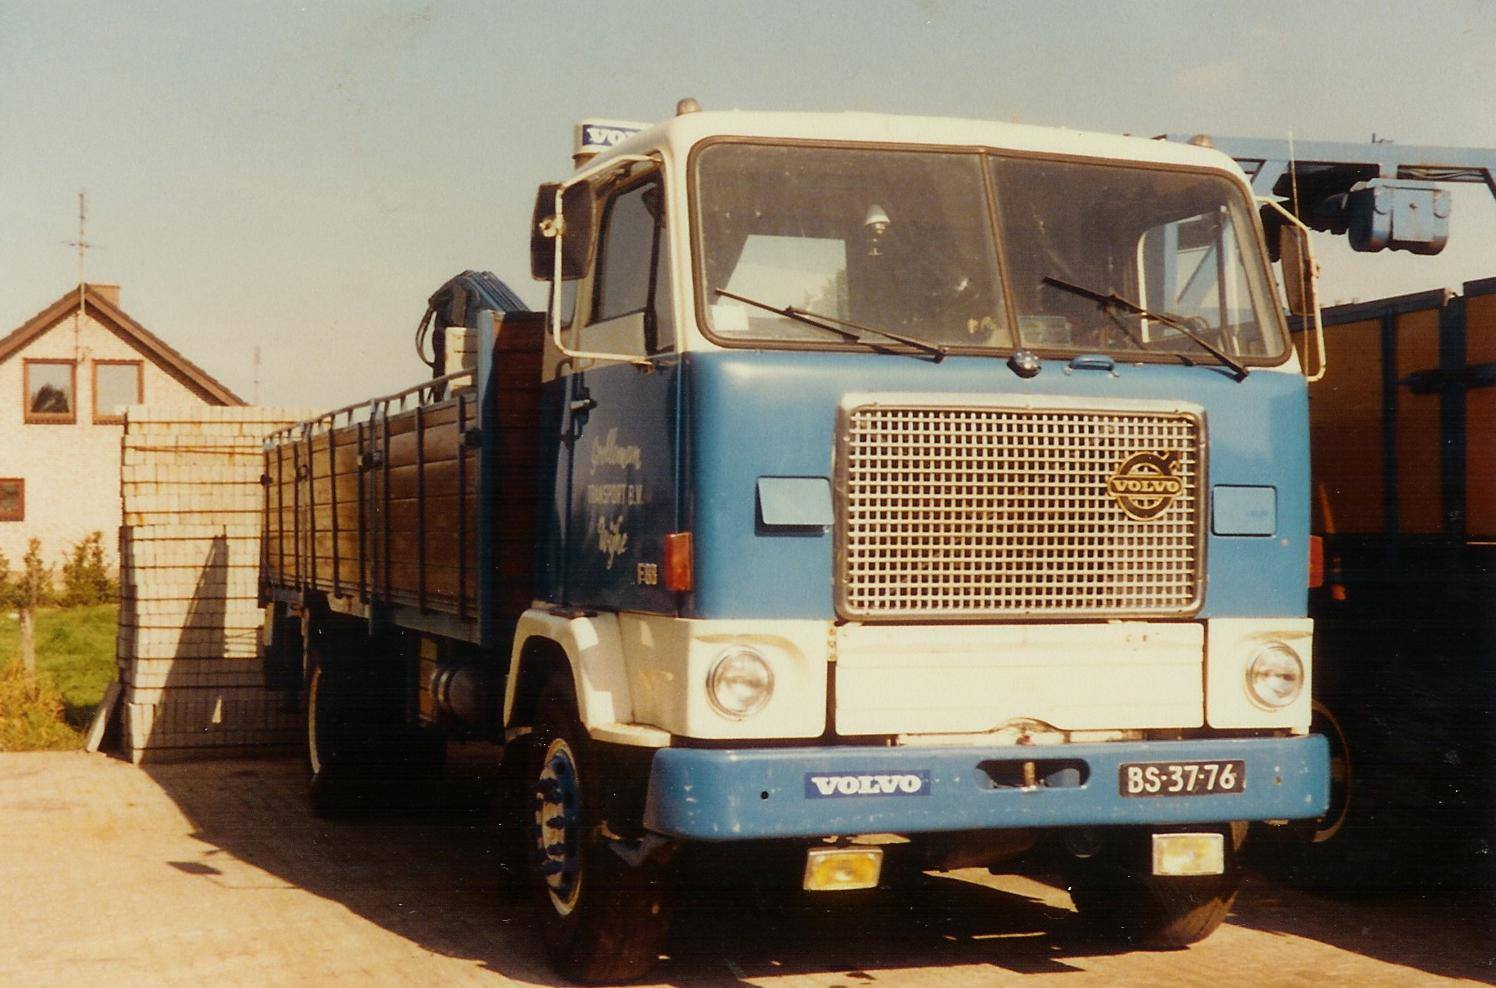 Volvo-F88-BS-37-76